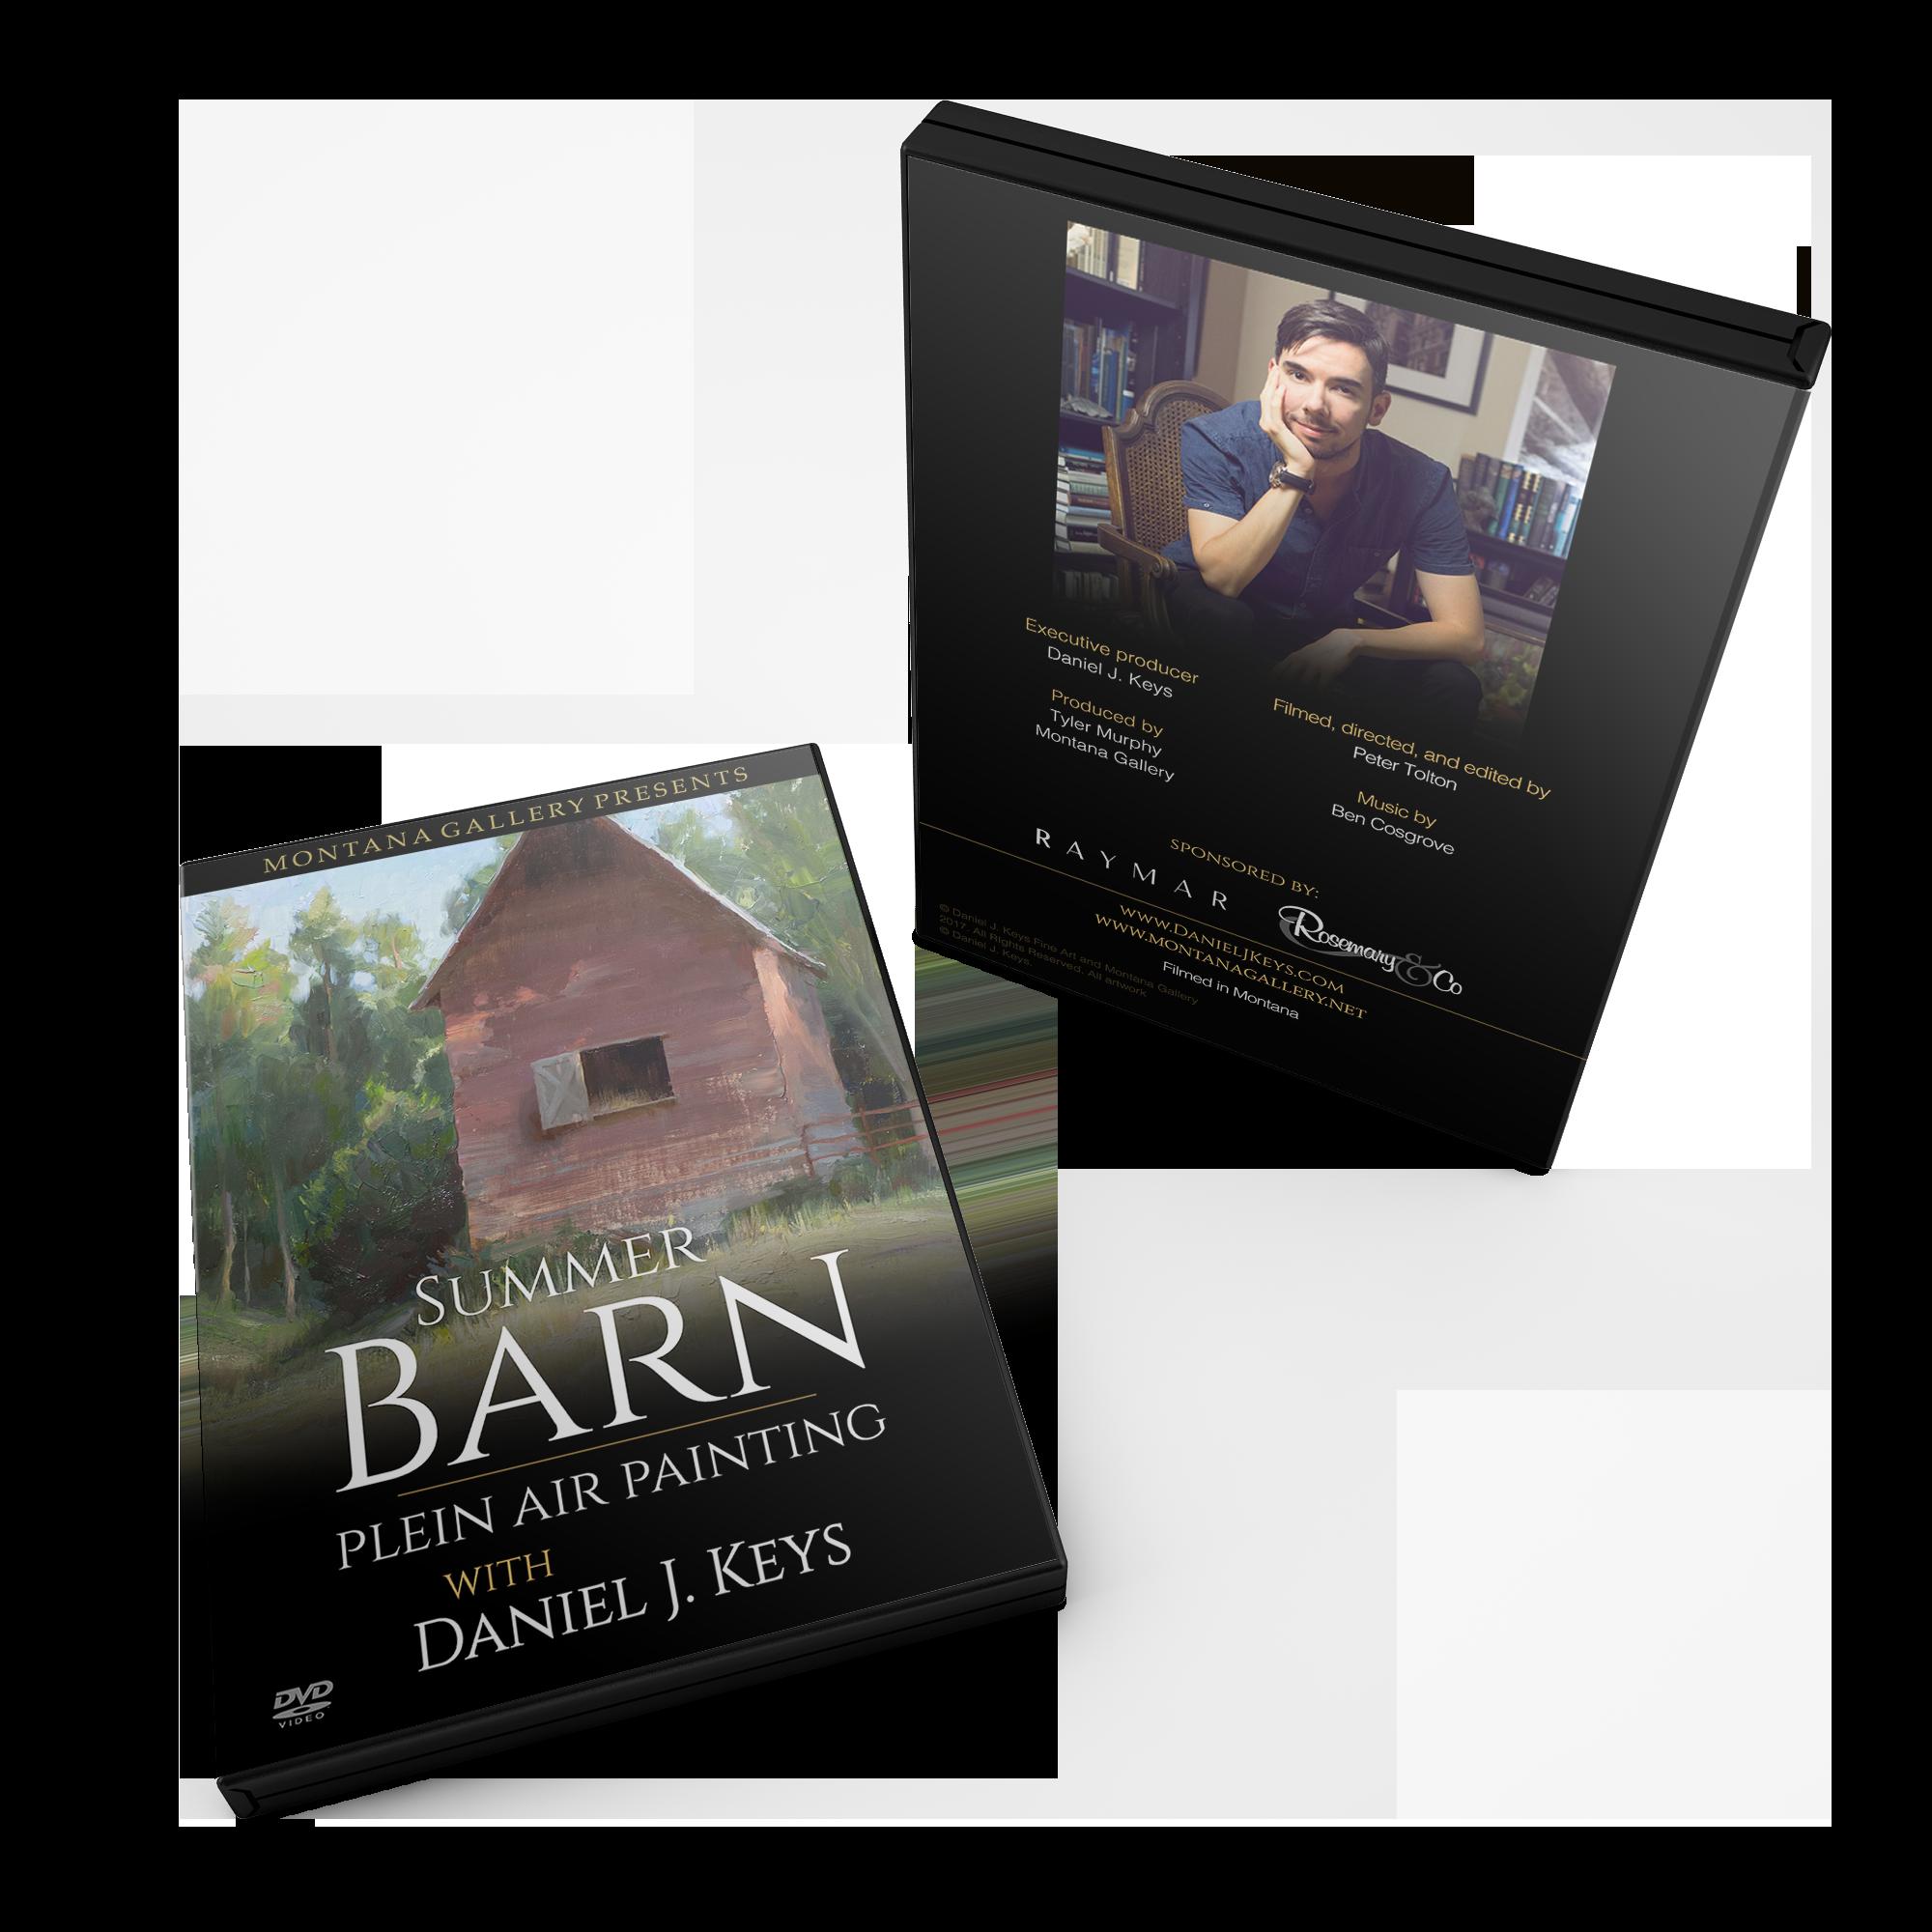 2017-11-17 Summer barn DVD mockup nobg.png